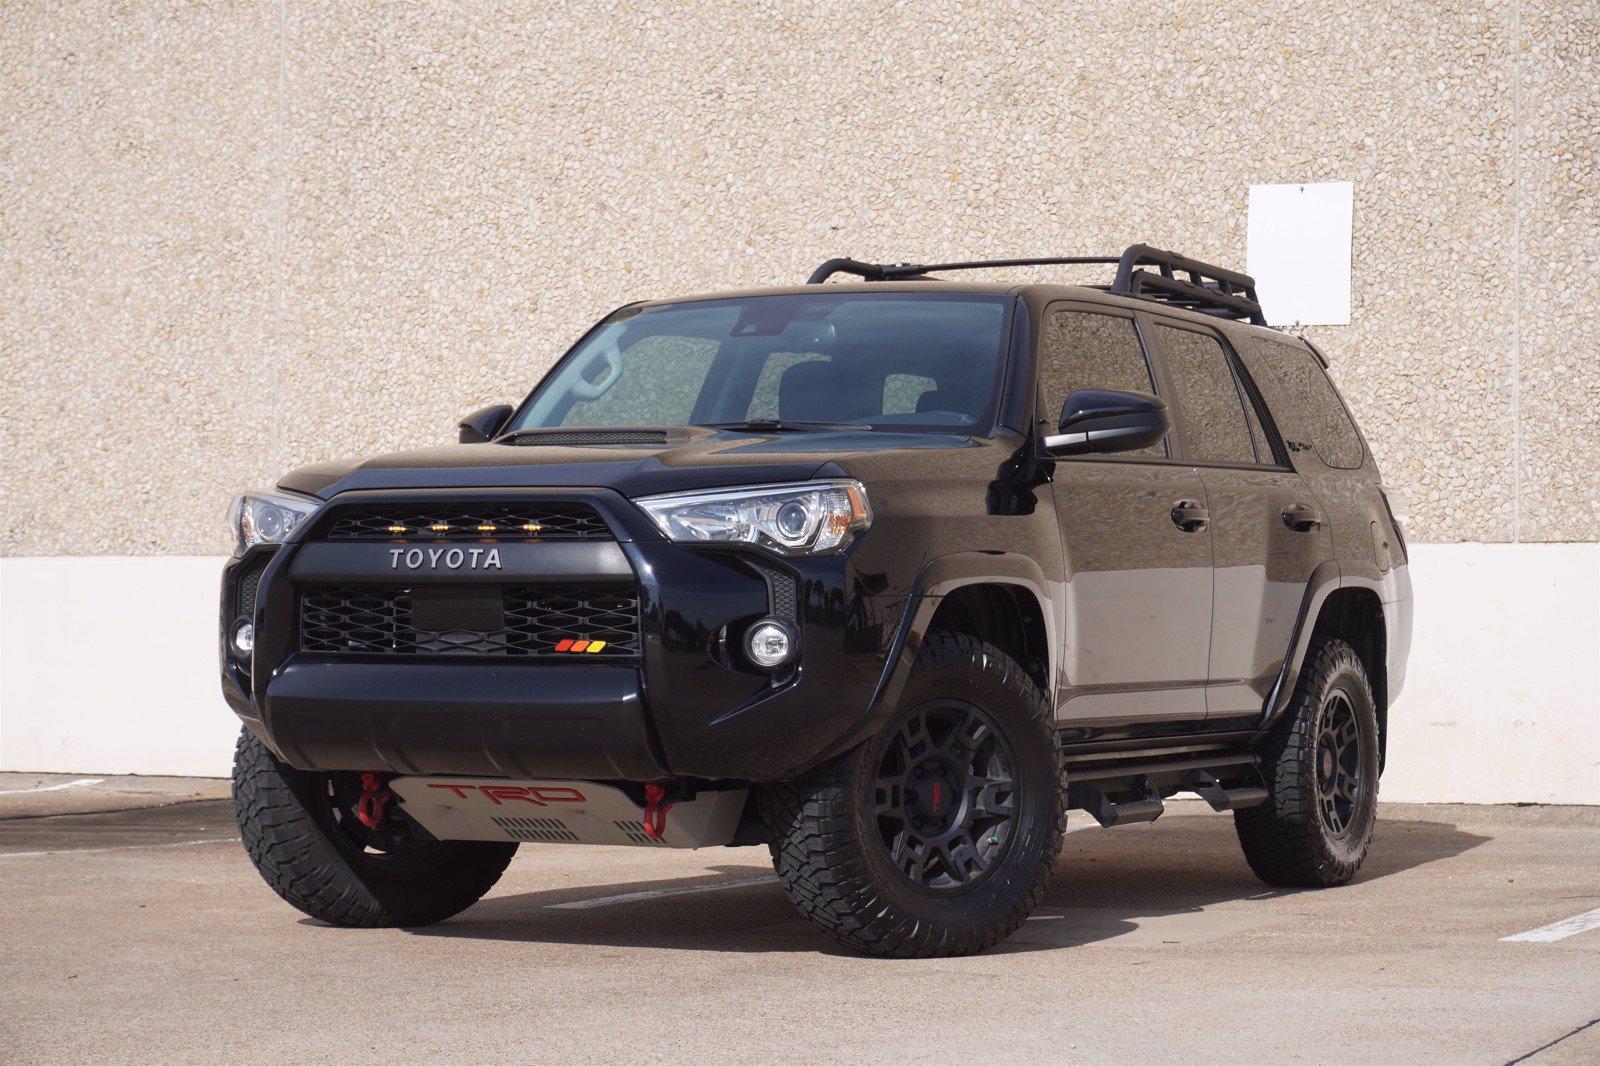 2020 Toyota 4Runner Vehicle Photo in Grapevine, TX 76051